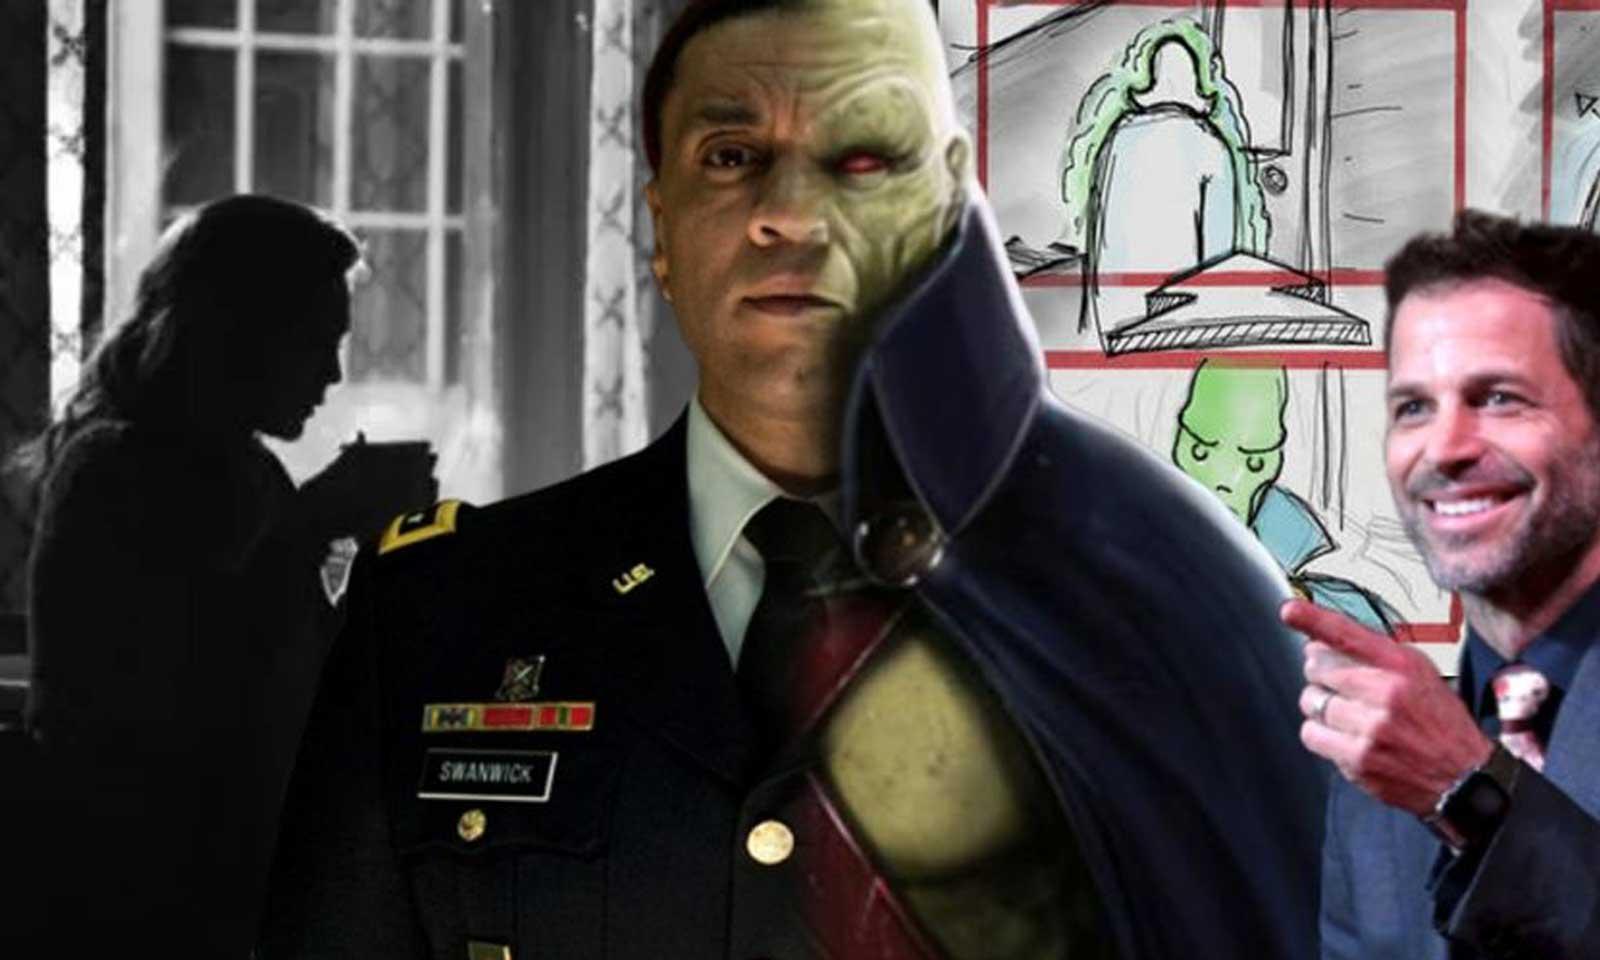 Harry-Lennix-General-Swanwick-Martian-Manhunter-Zack-Snyder-Justice-League-revelado